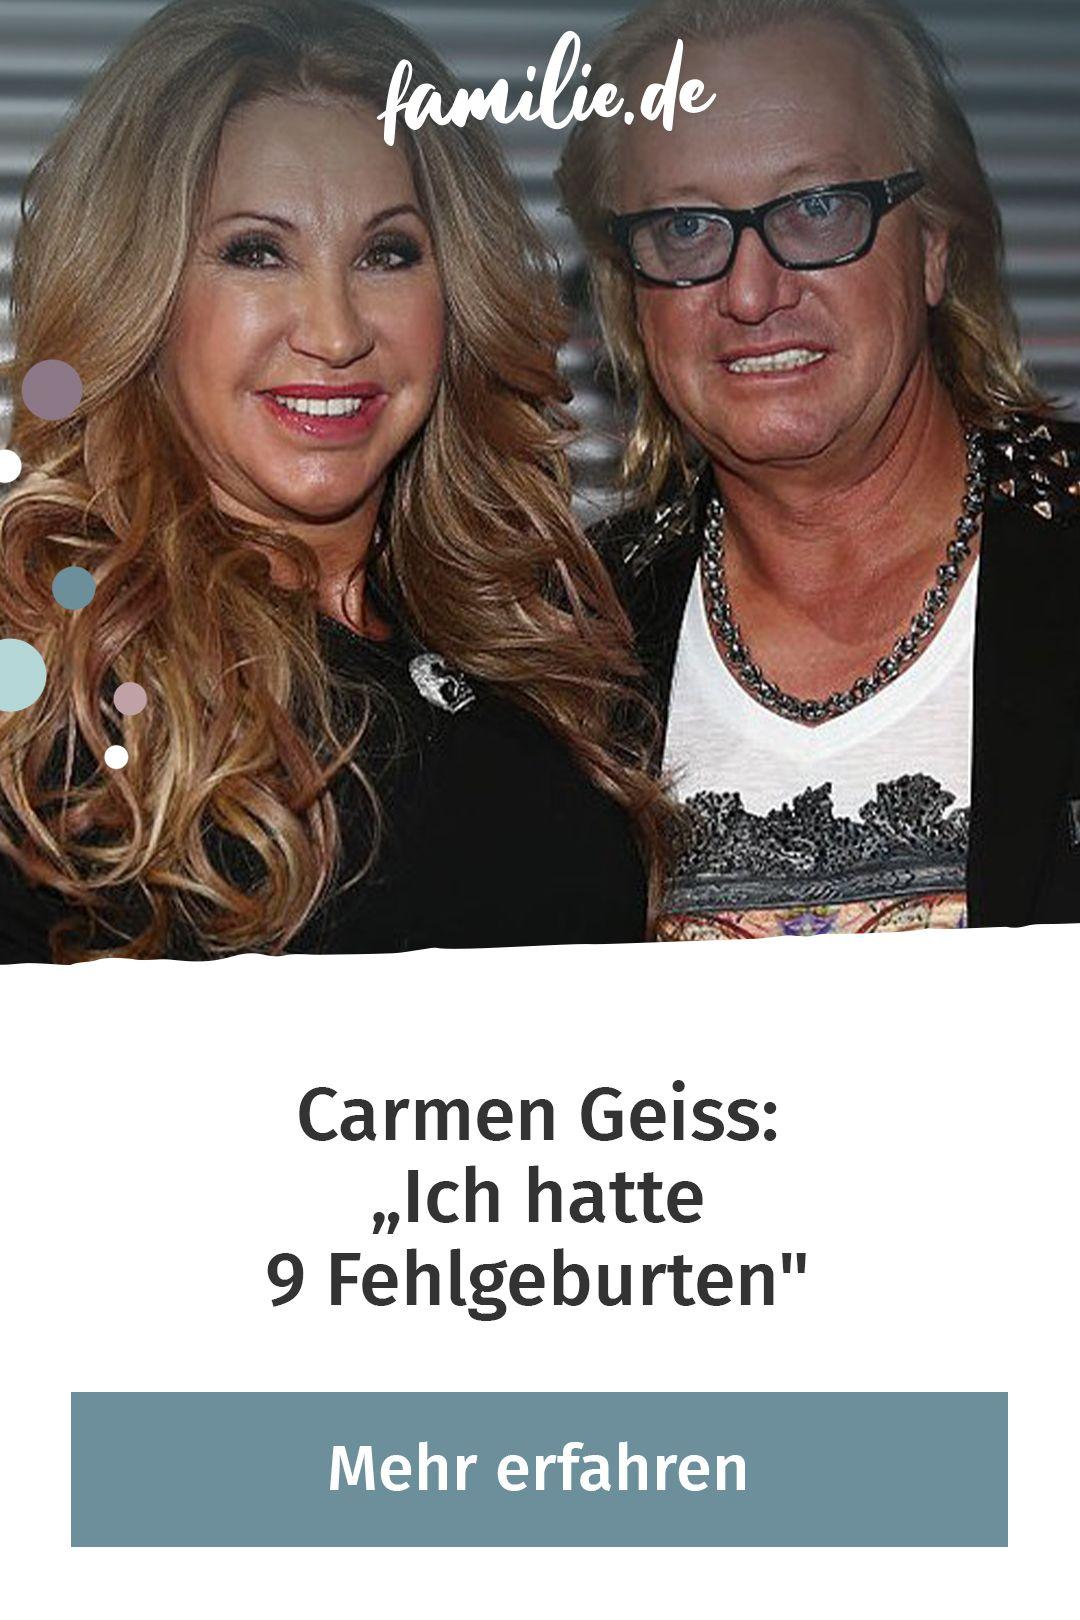 Carmen Geiss Fehlgeburten